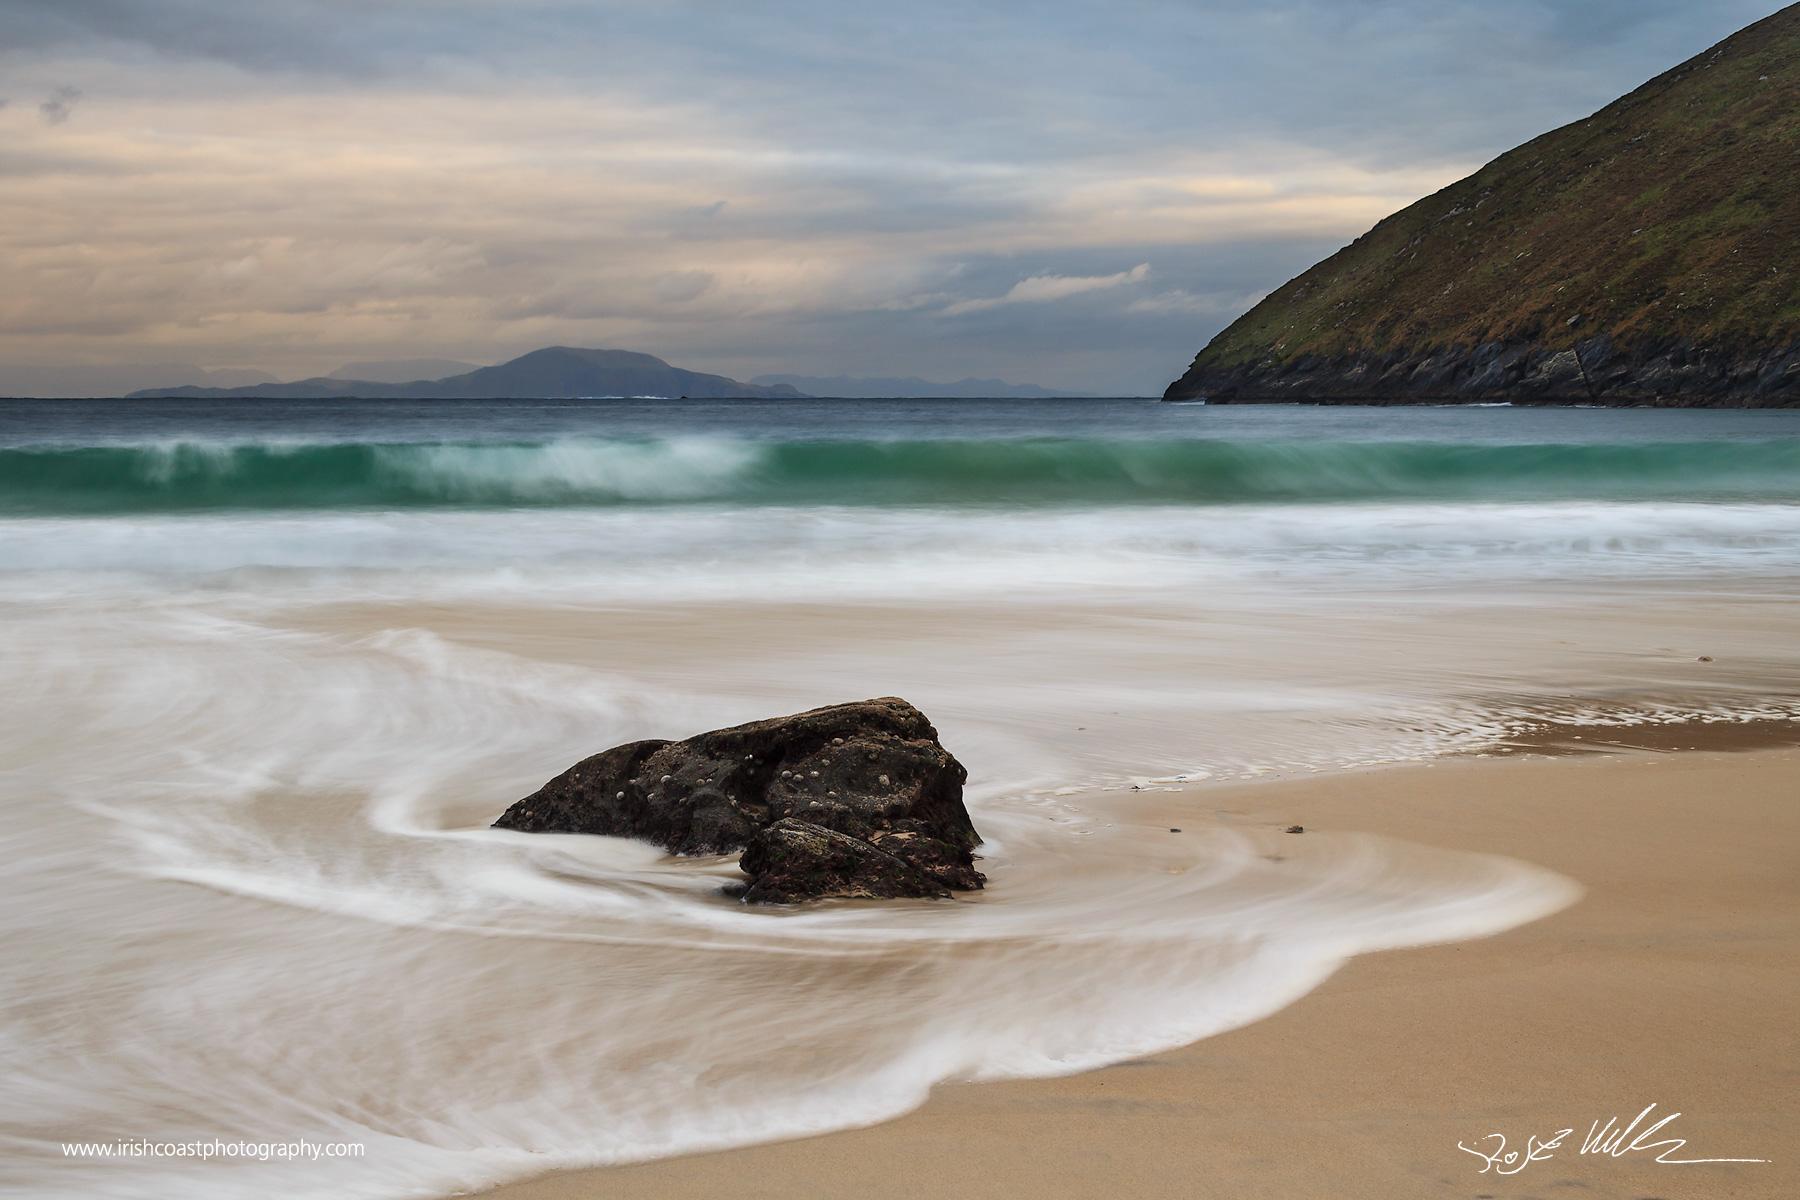 Big swell at Keem Strand, Achill, Co. Mayo